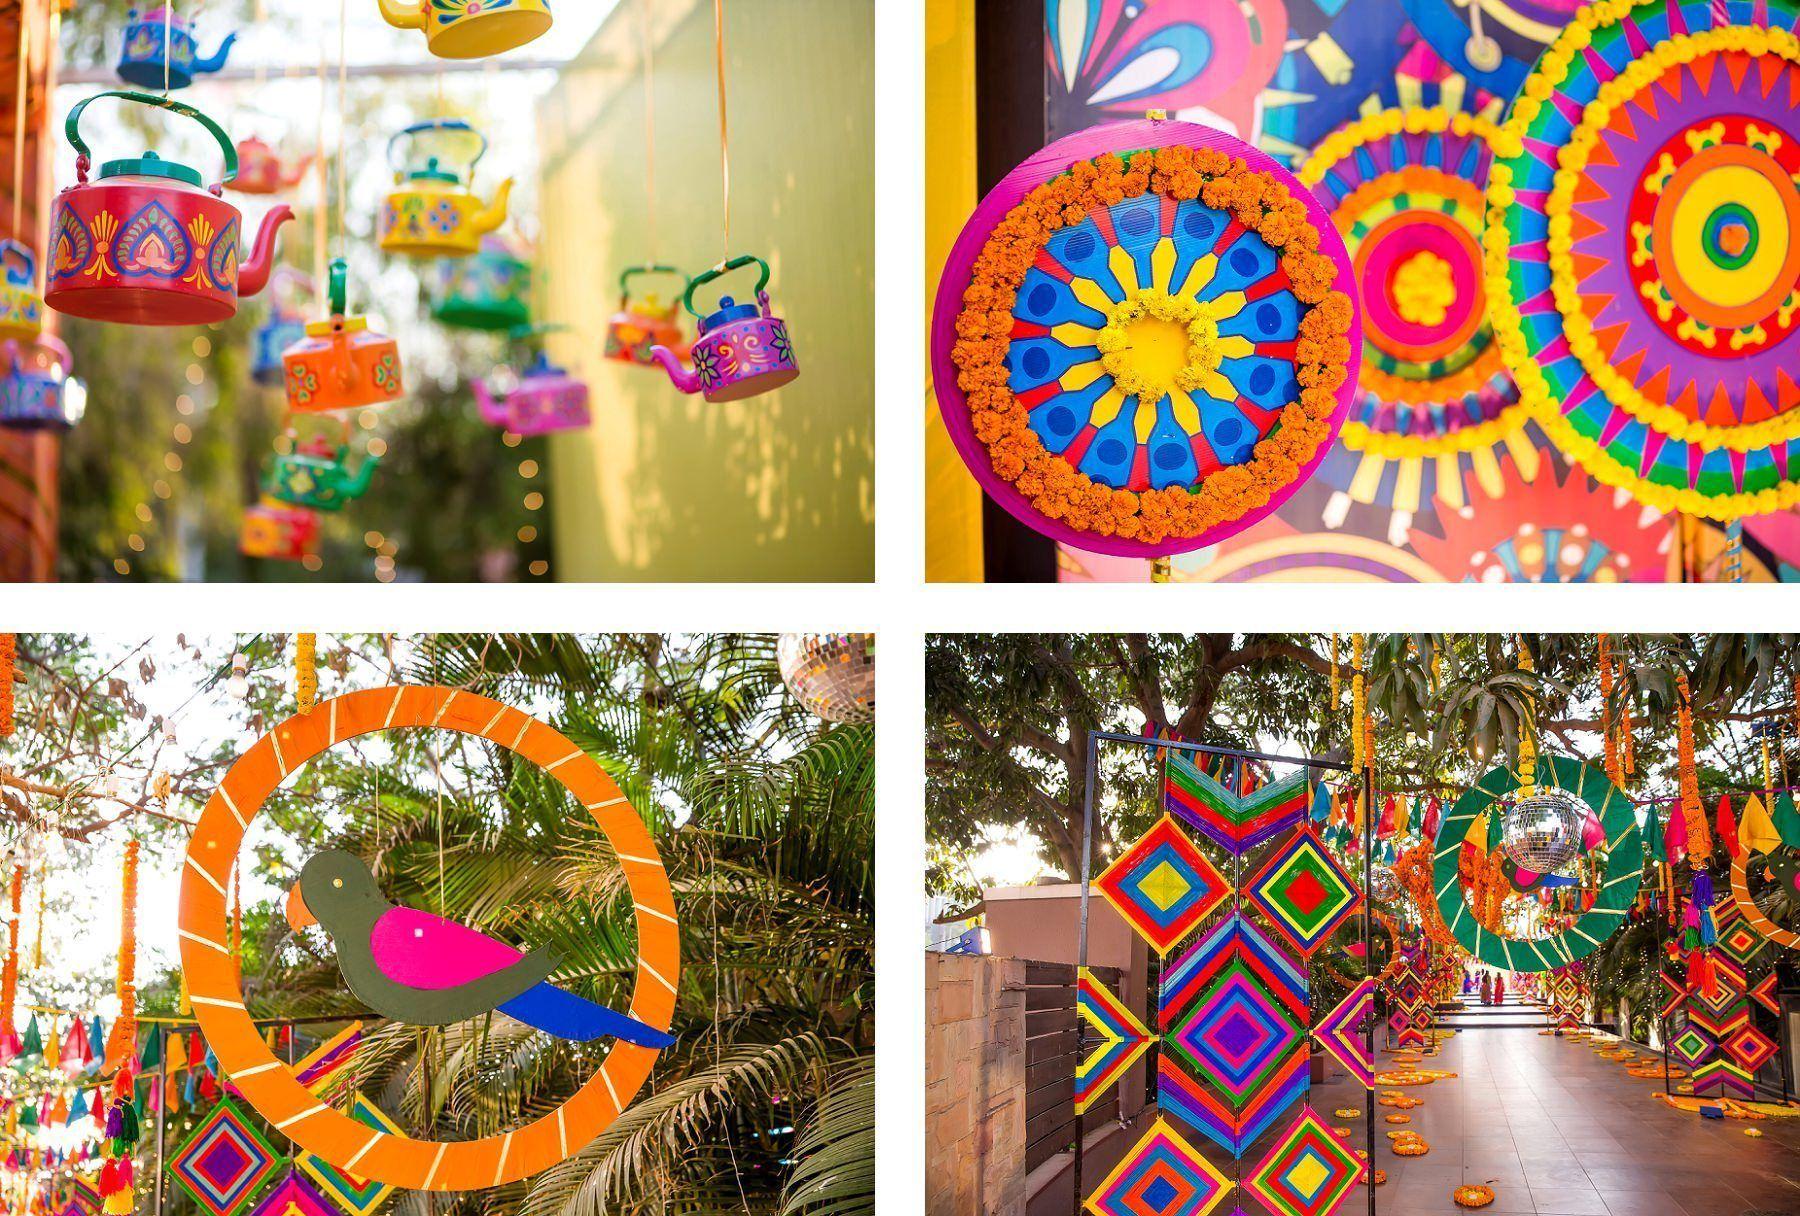 Mehndi Backdrop Diy : Mela theme colorful mehndi sangeet wedding photography ahmedabad